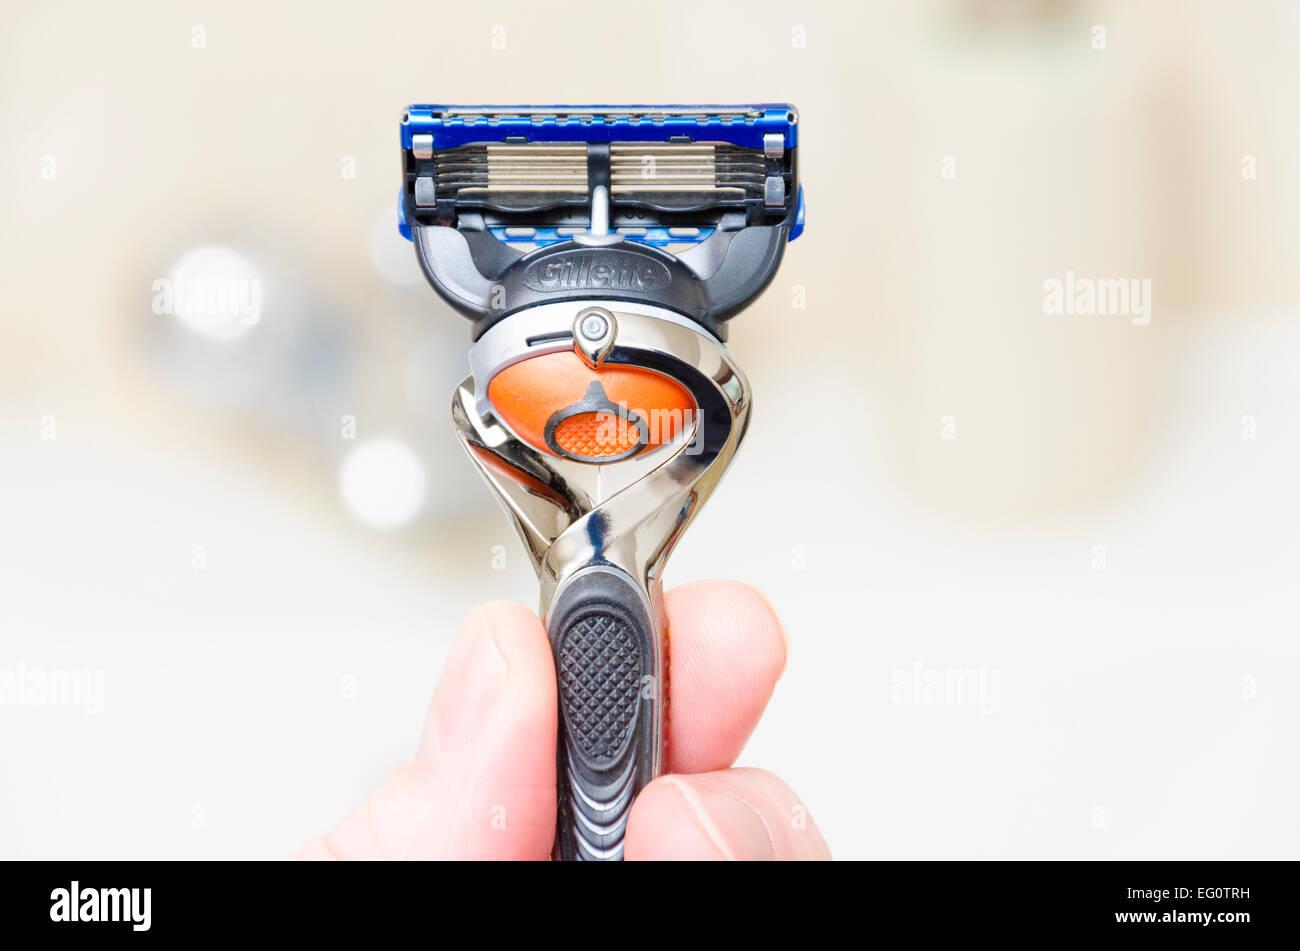 Gillette ProGlide FlexBall razor - Stock Image